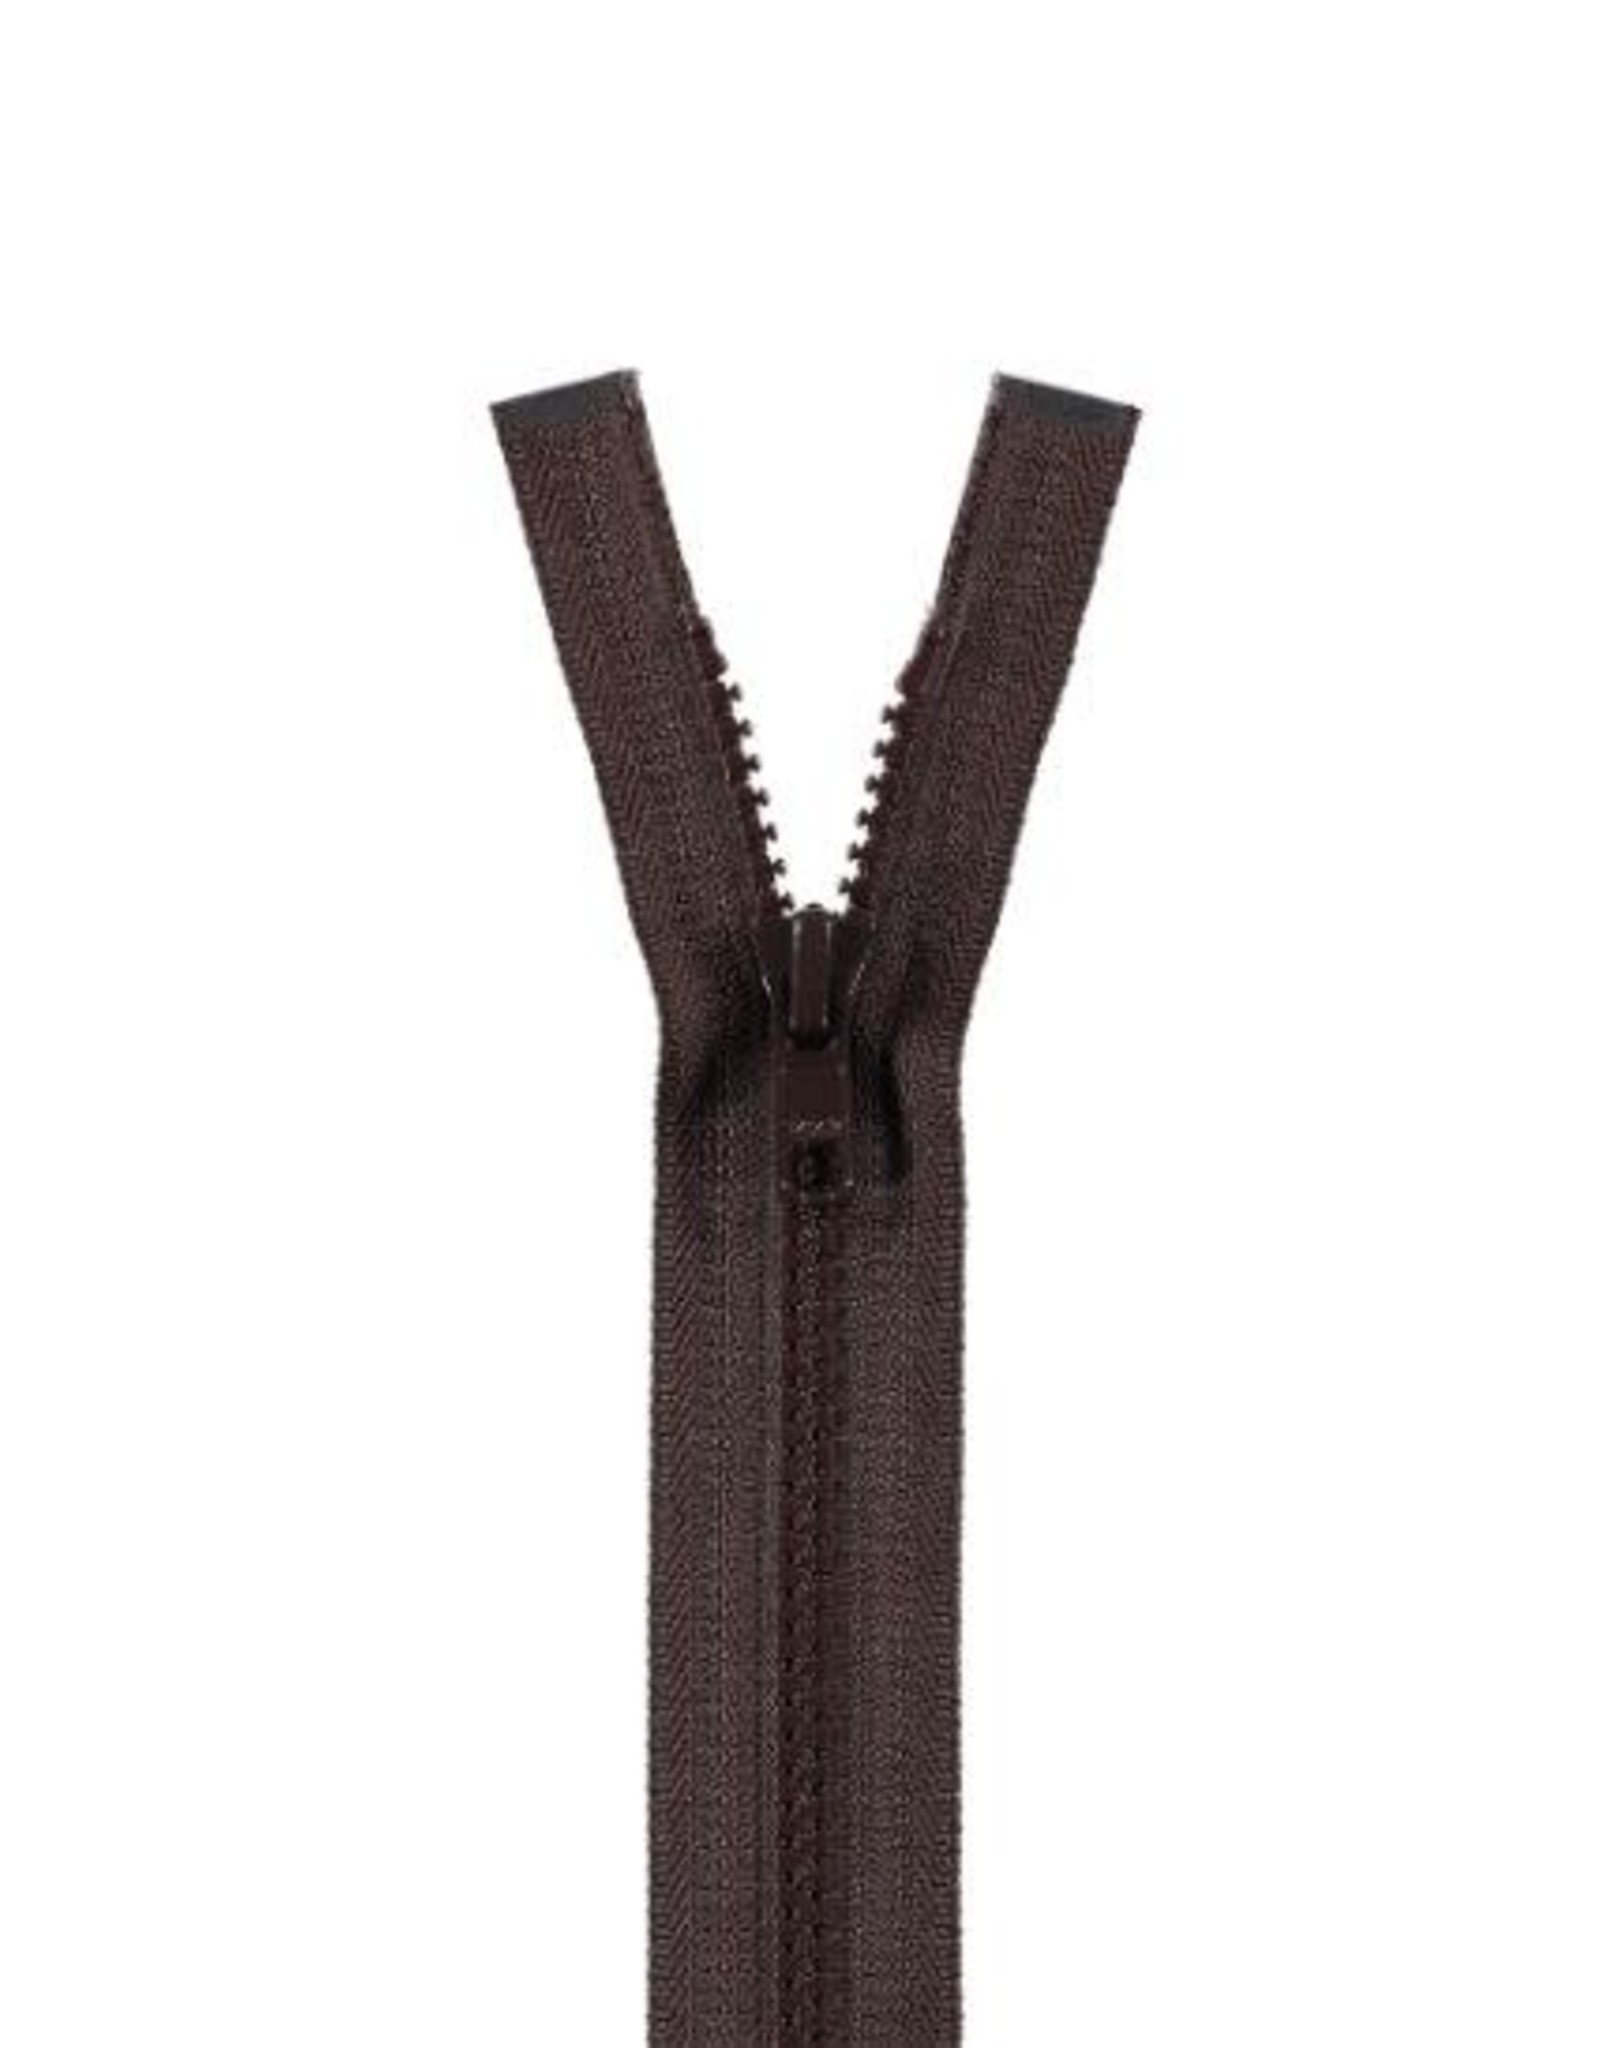 YKK BLOKRITS 5 DEELBAAR bruin 570-75cm